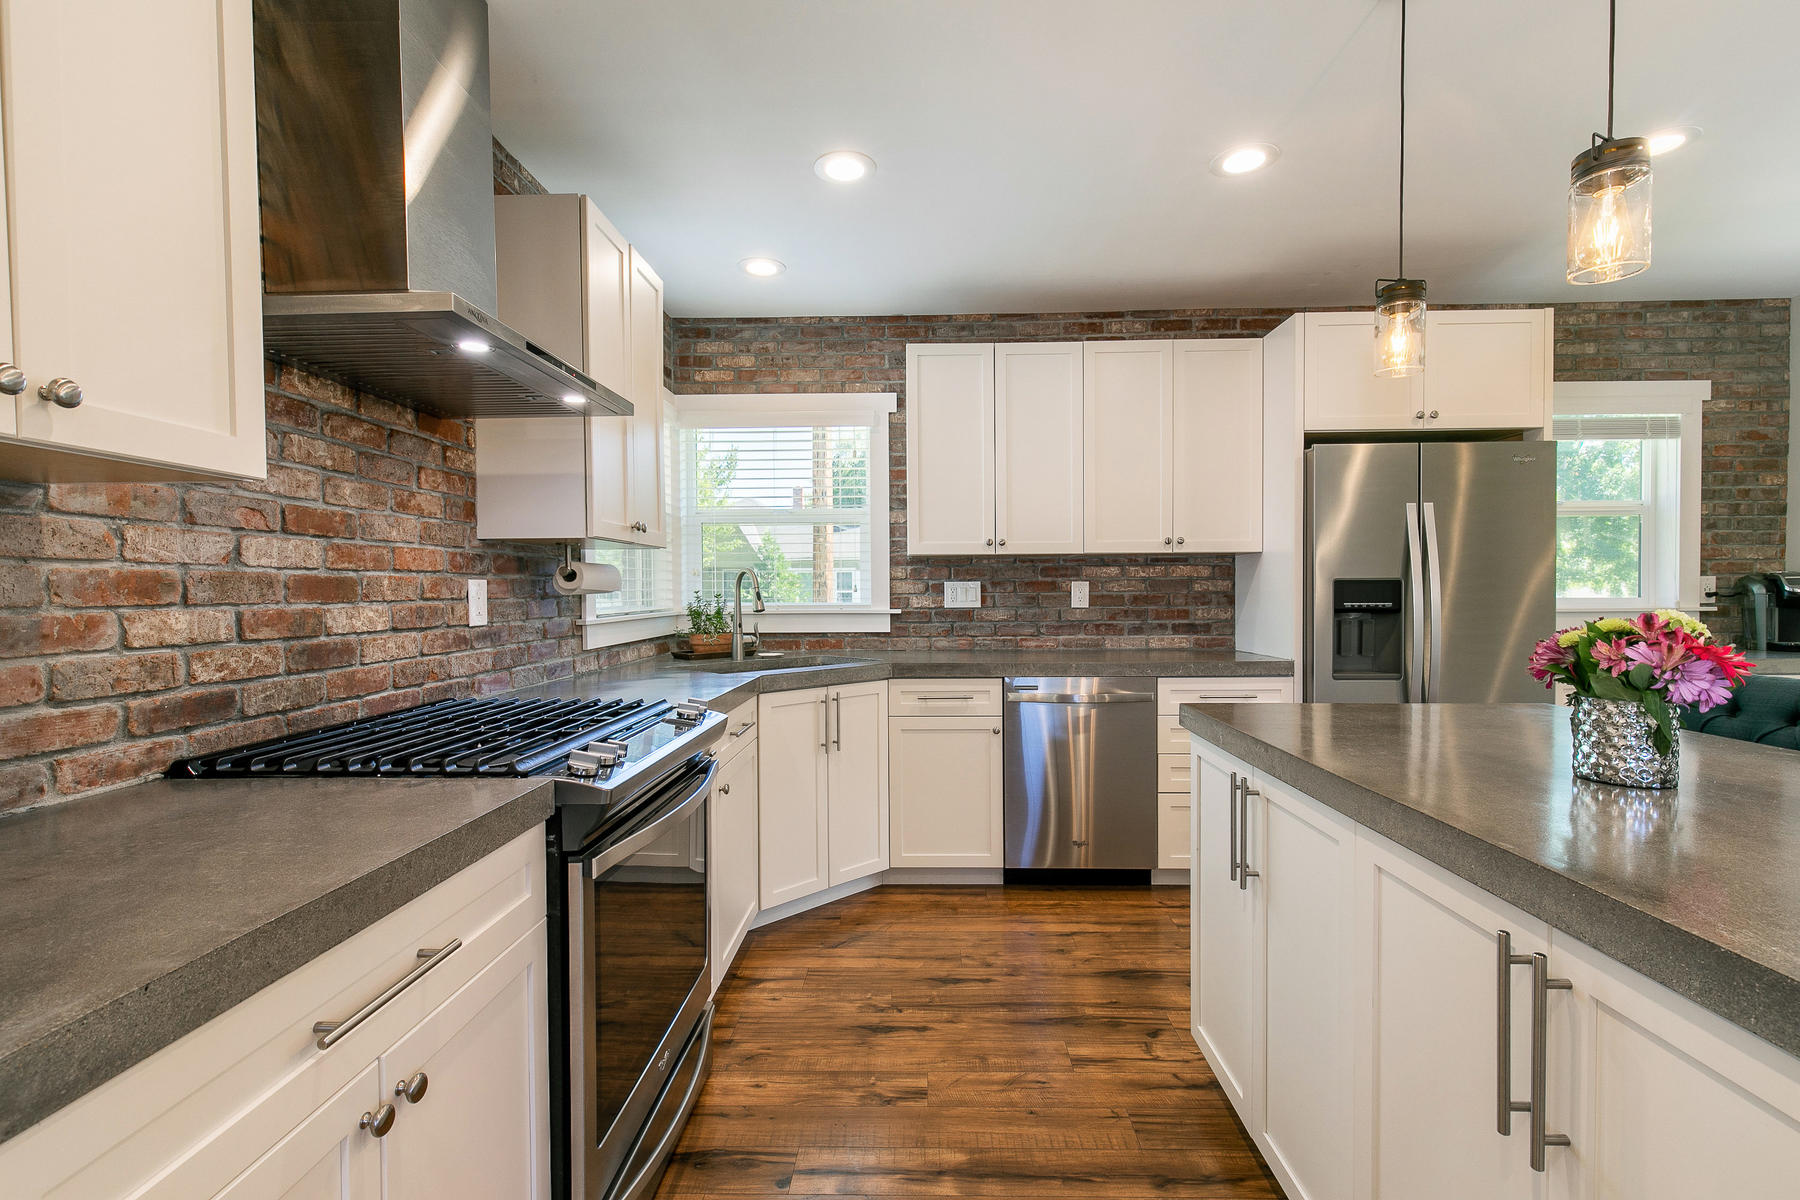 Additional photo for property listing at 1234 Manor Drive, Reno NV 89509 1234 Manor Drive Reno, Nevada 89509 United States